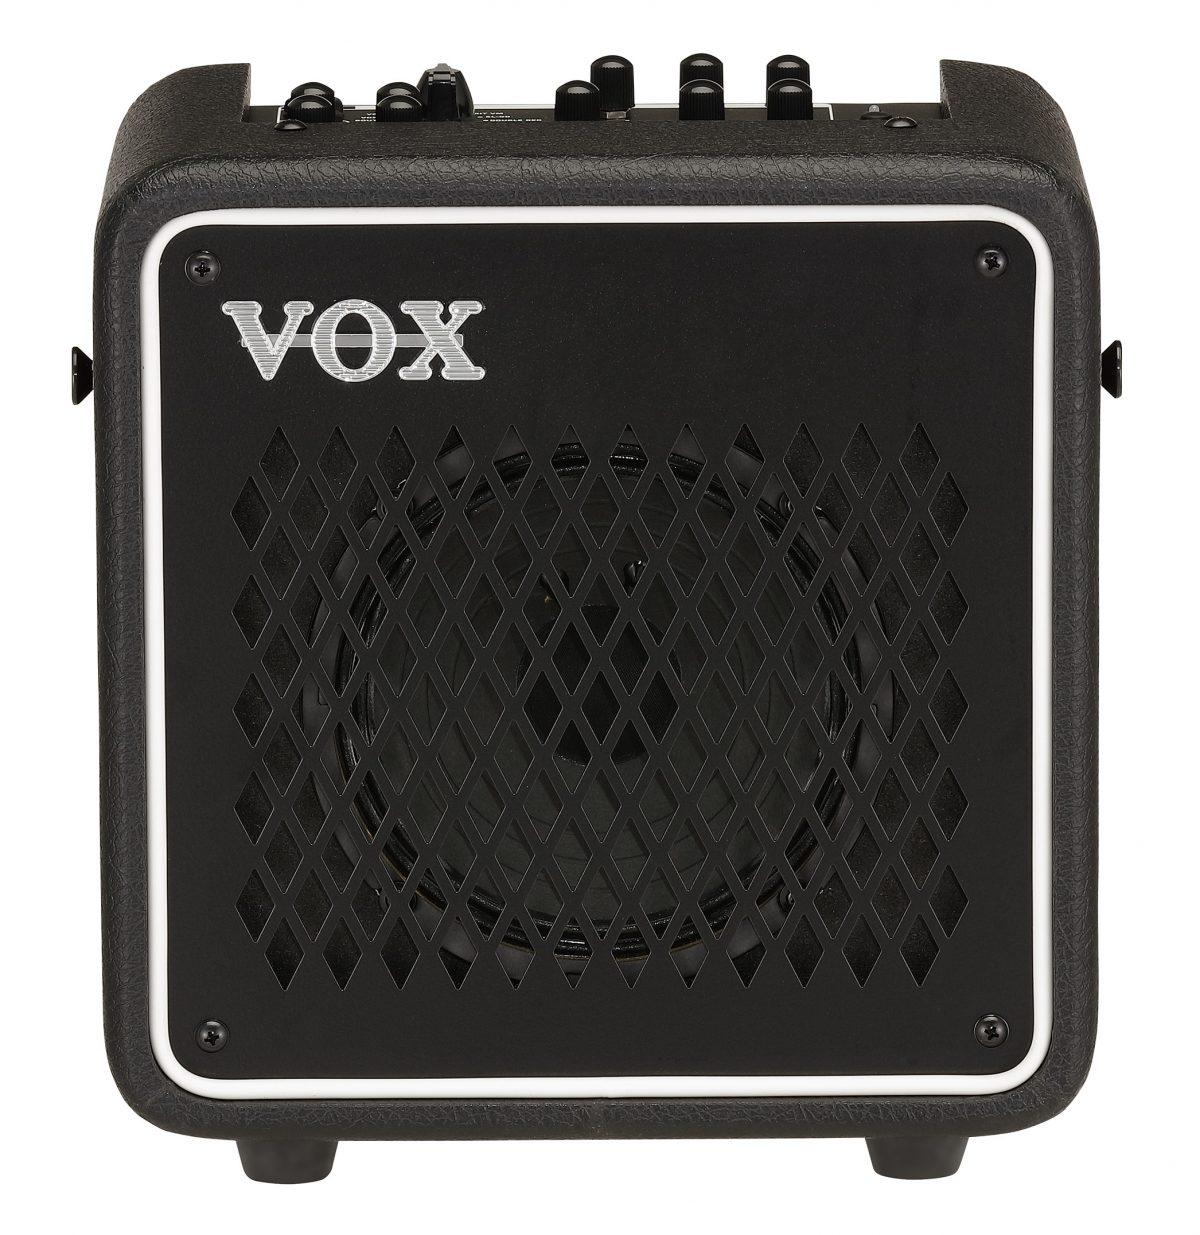 Vox VMG10 front